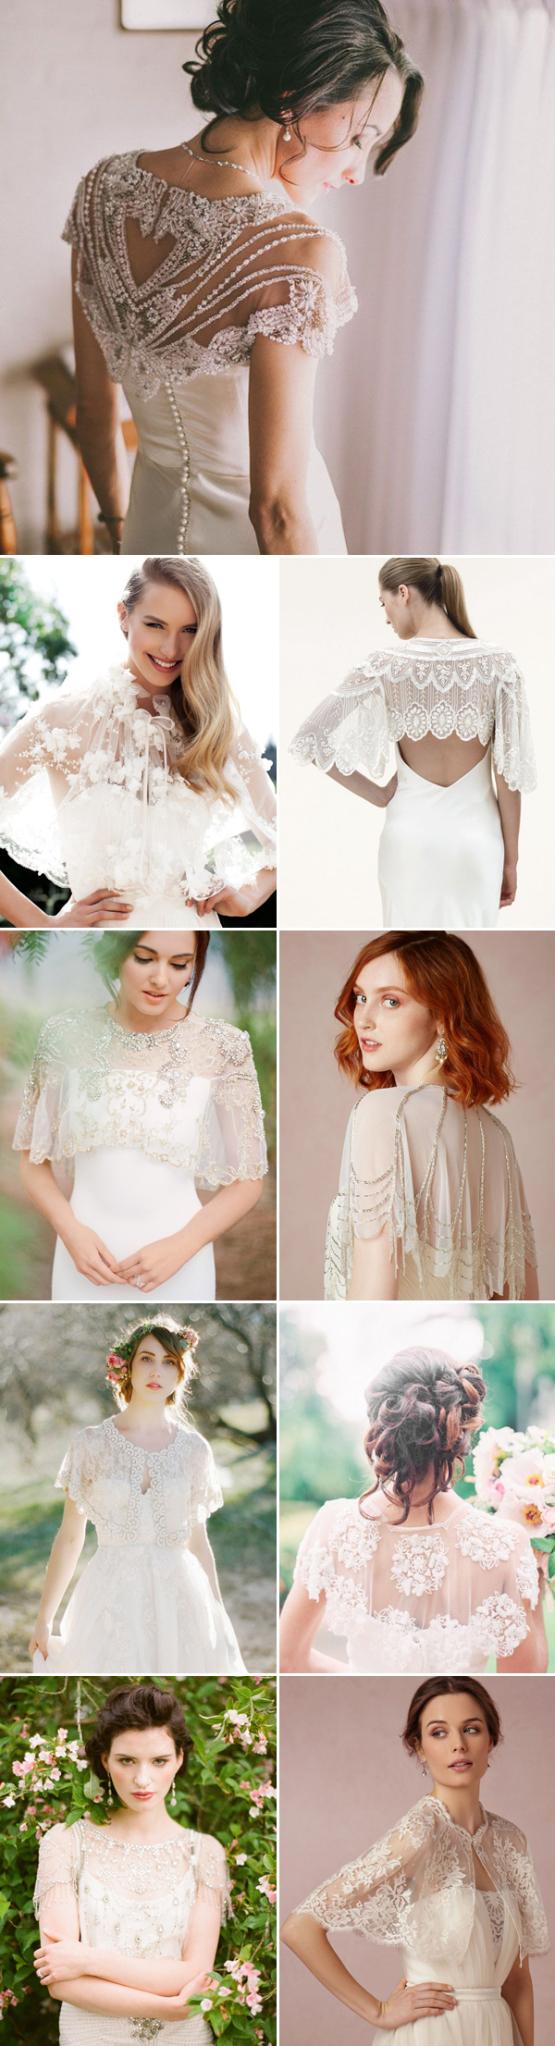 Наметки за идните невести wedding pinterest wedding dress